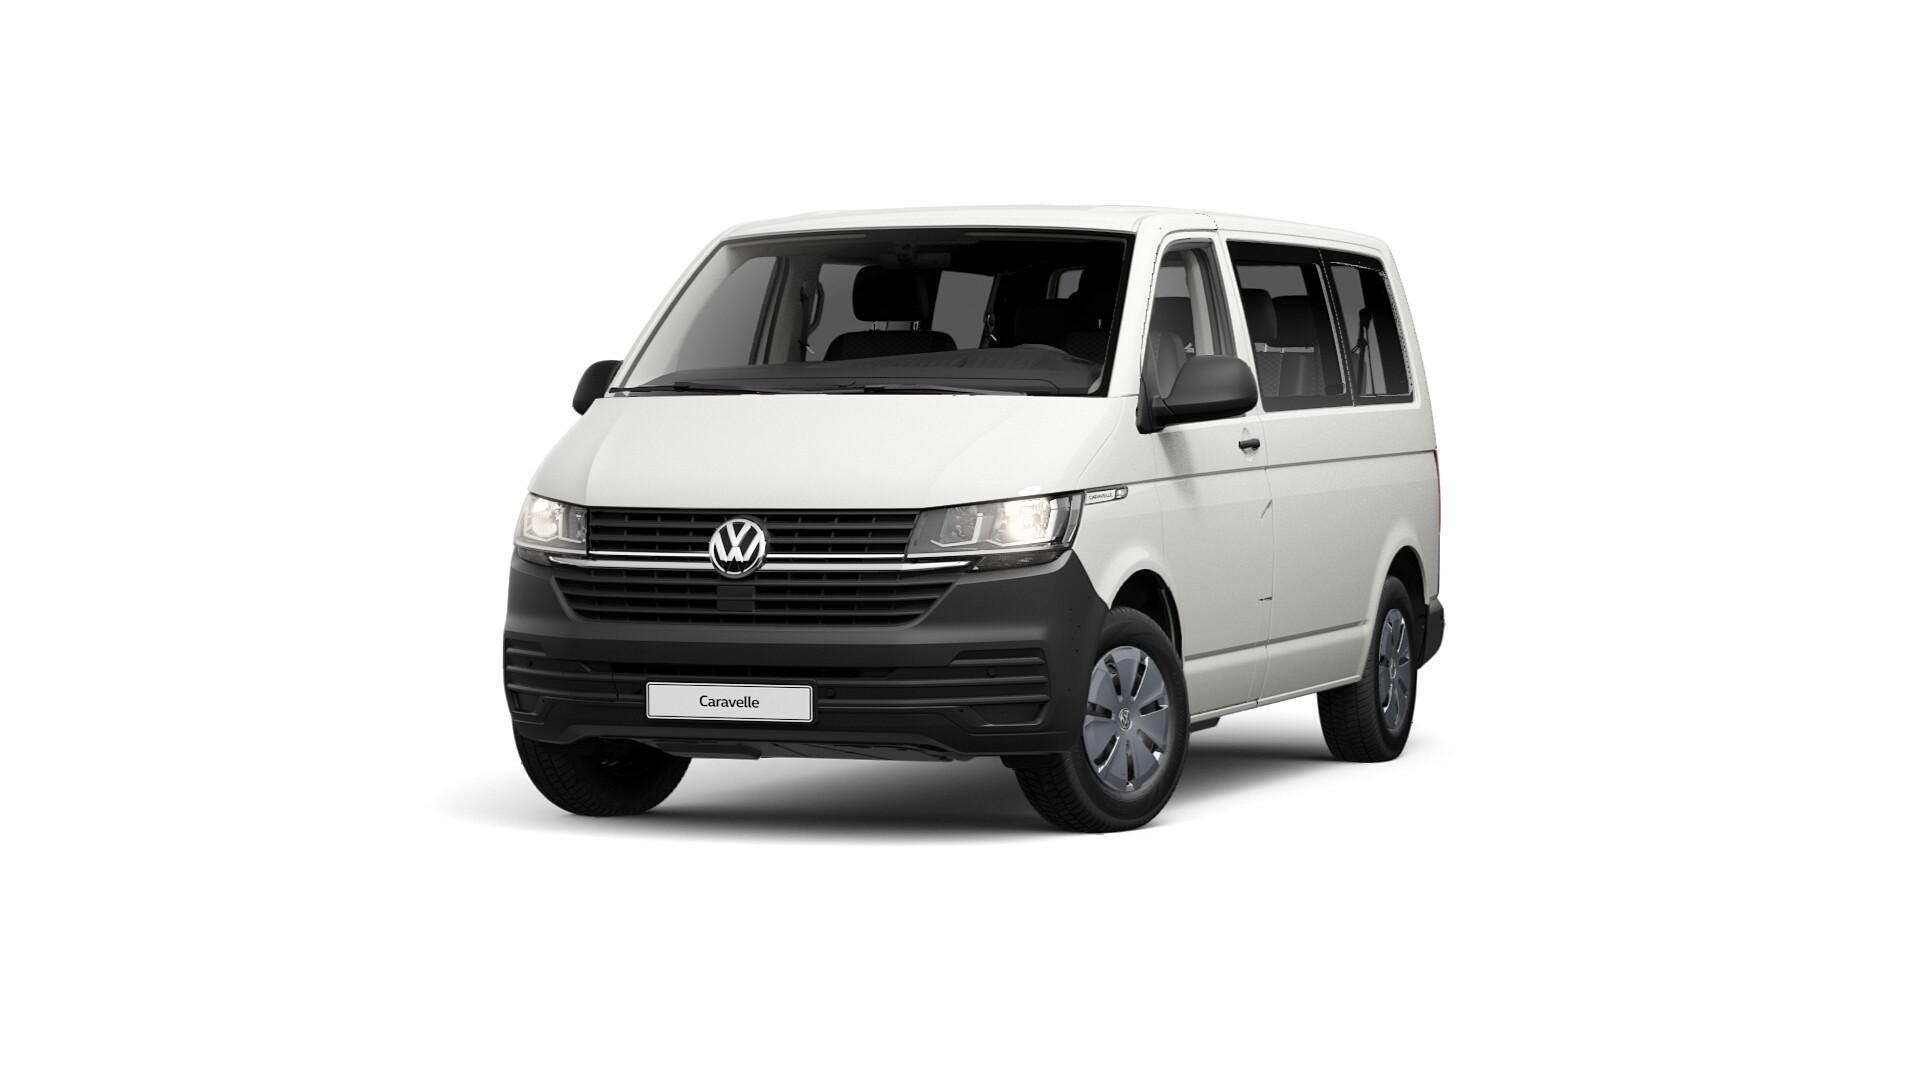 Volkswagen Caravelle компактвэн/минивэн (Trendline)